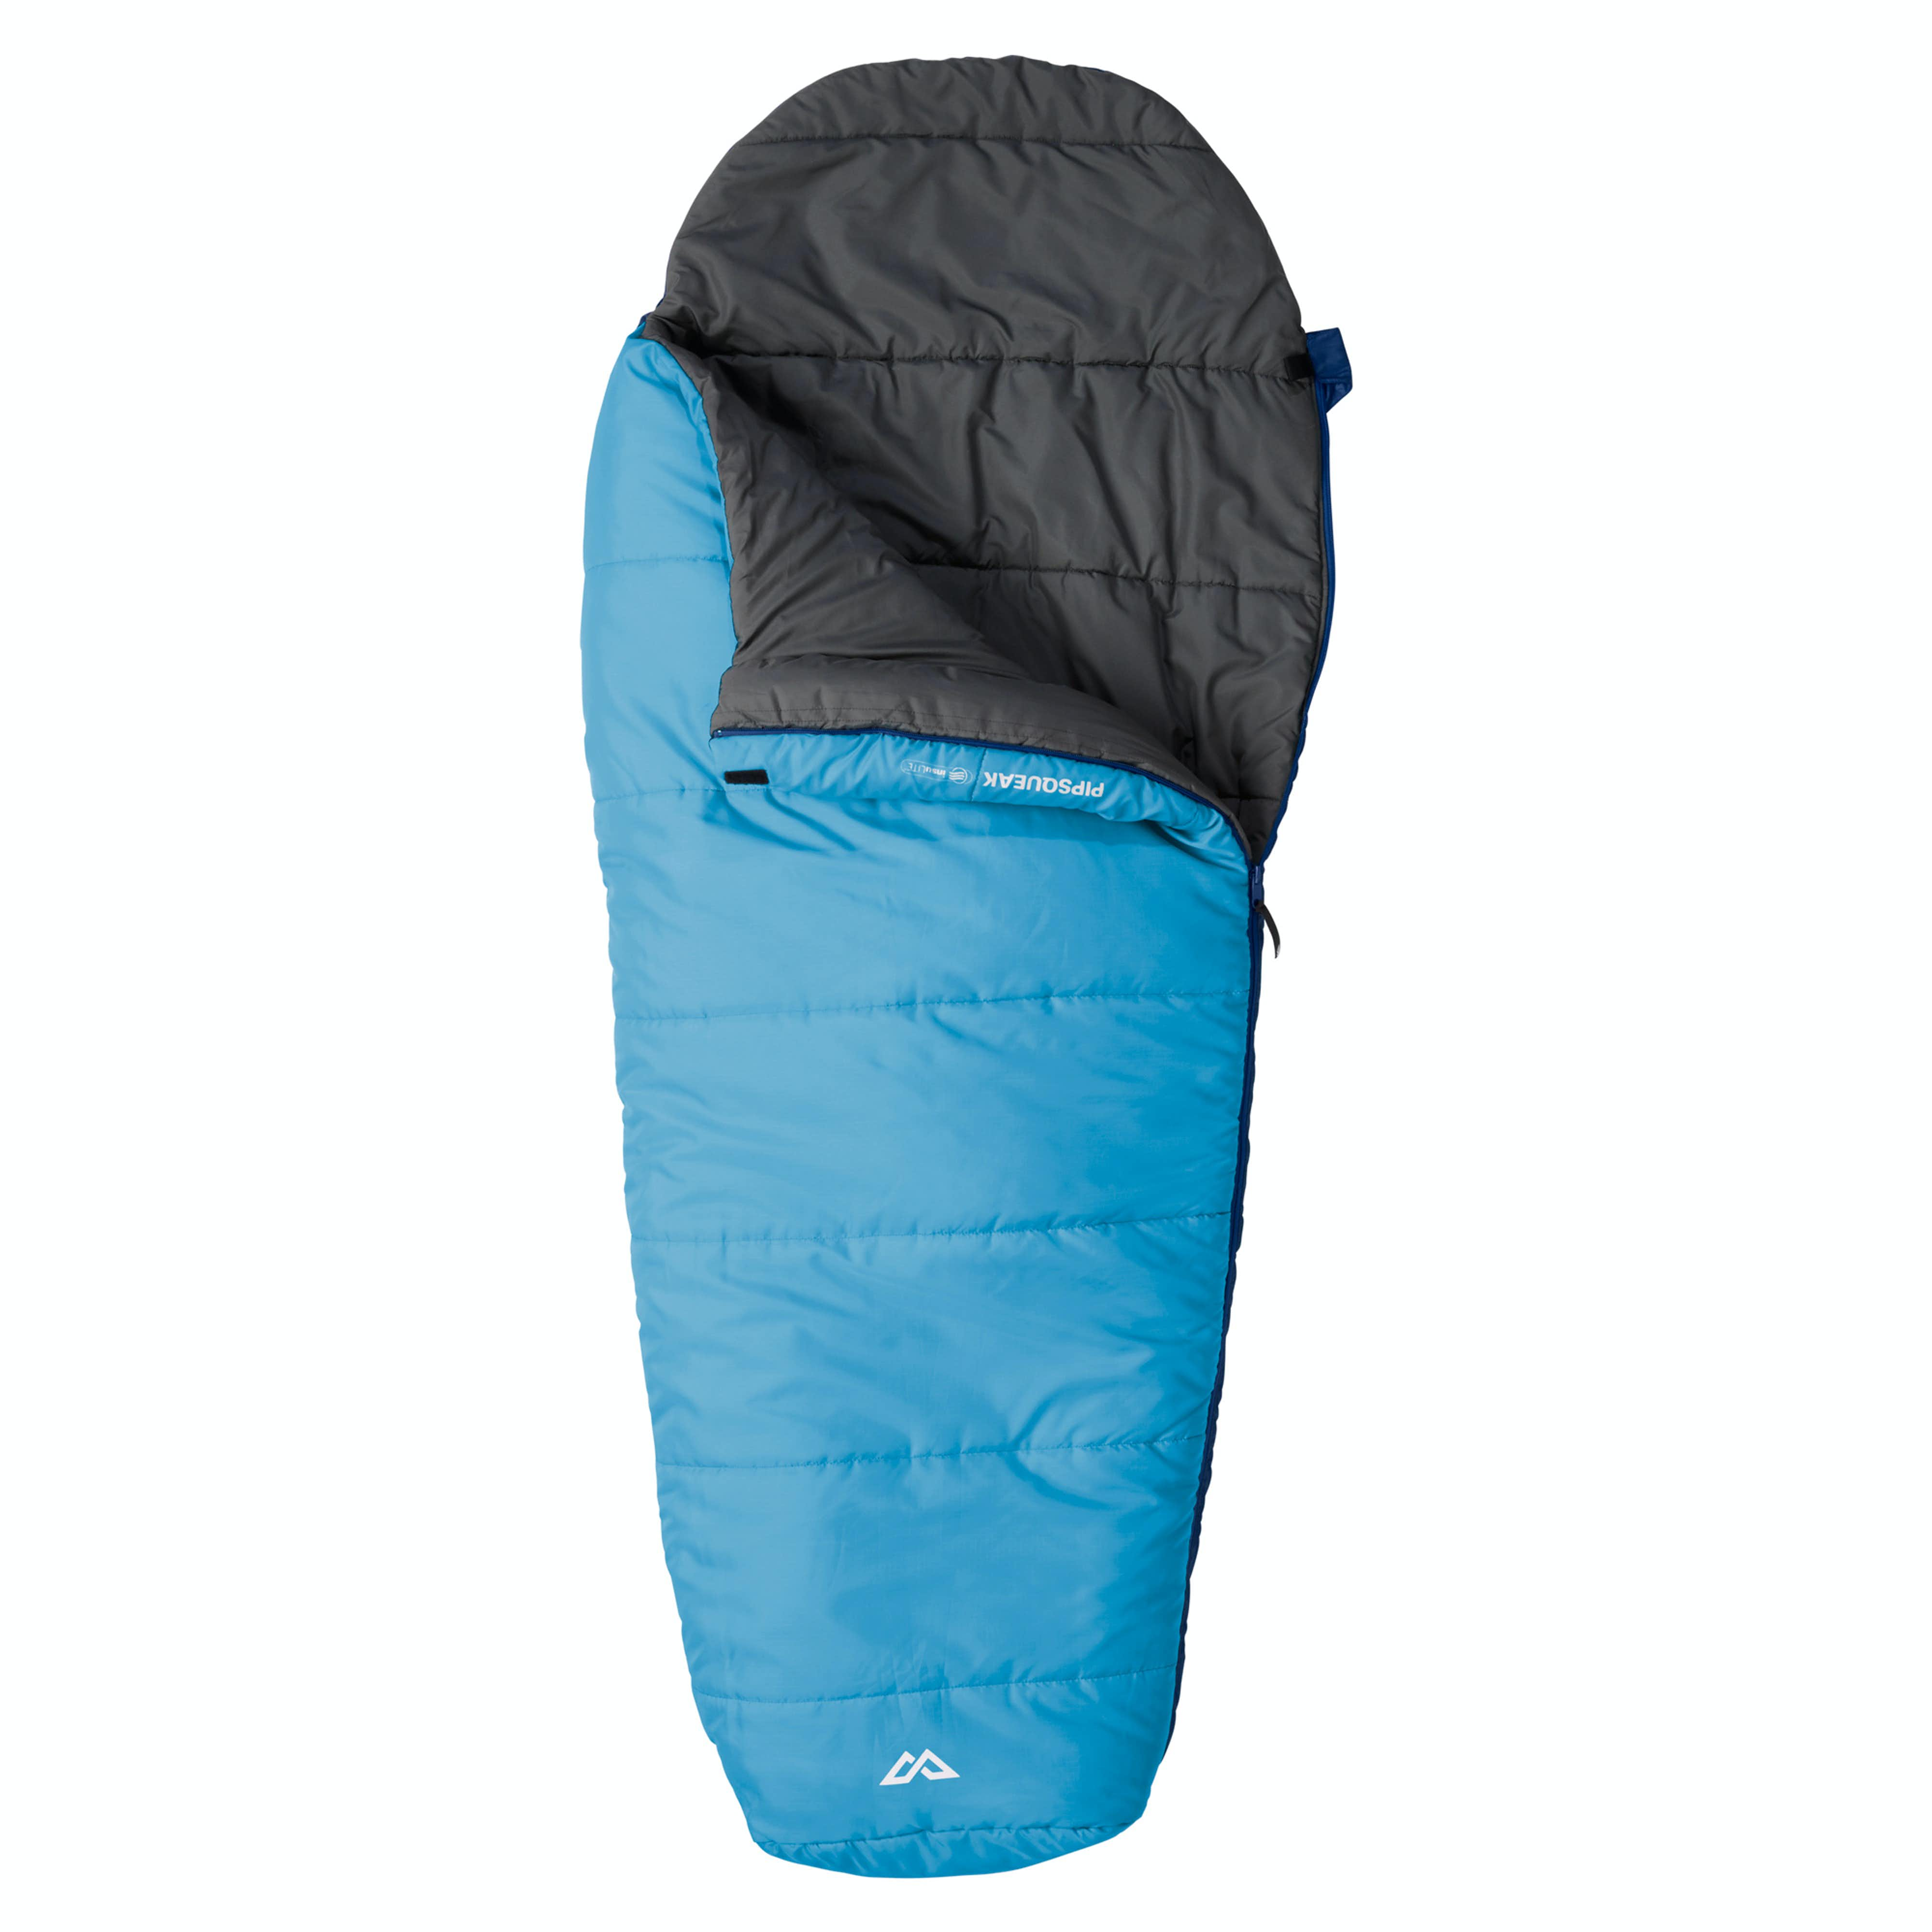 Pipsqueak Synthetic Sleeping Bag v5 88b34ea46